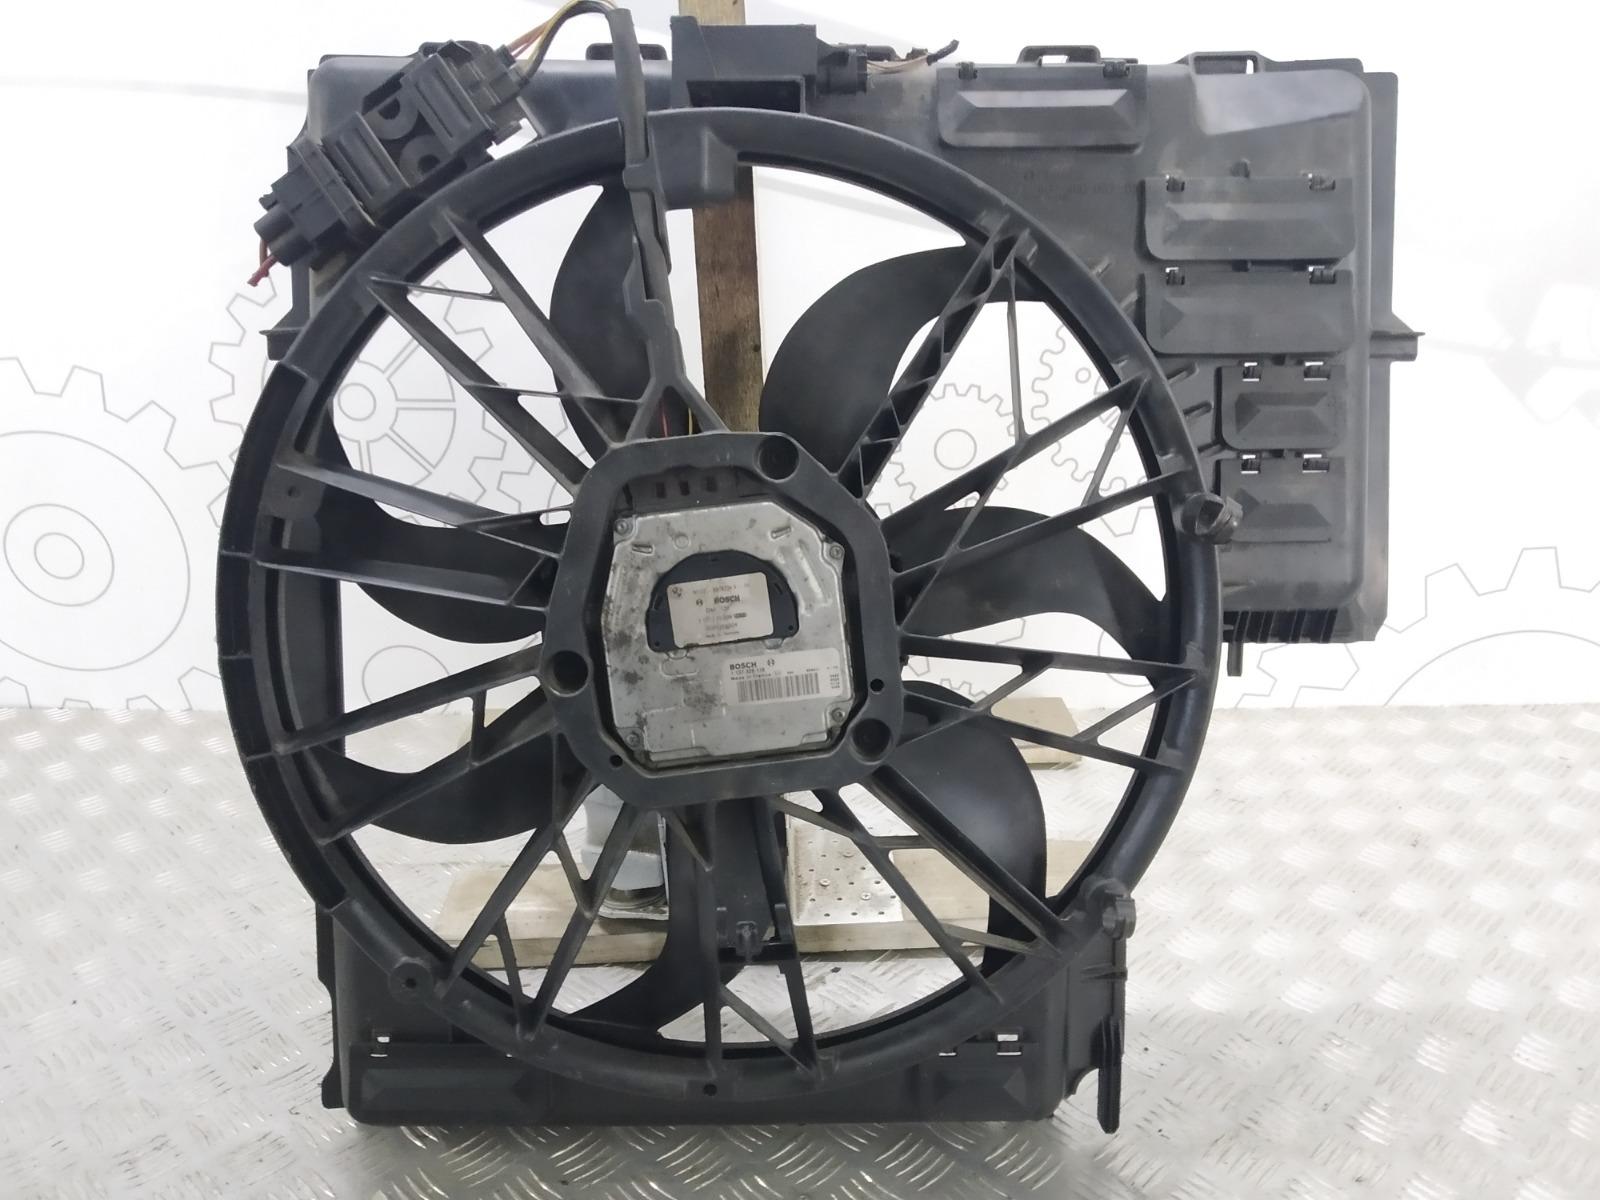 Вентилятор радиатора Bmw X5 E53 4.8 I 2005 (б/у)